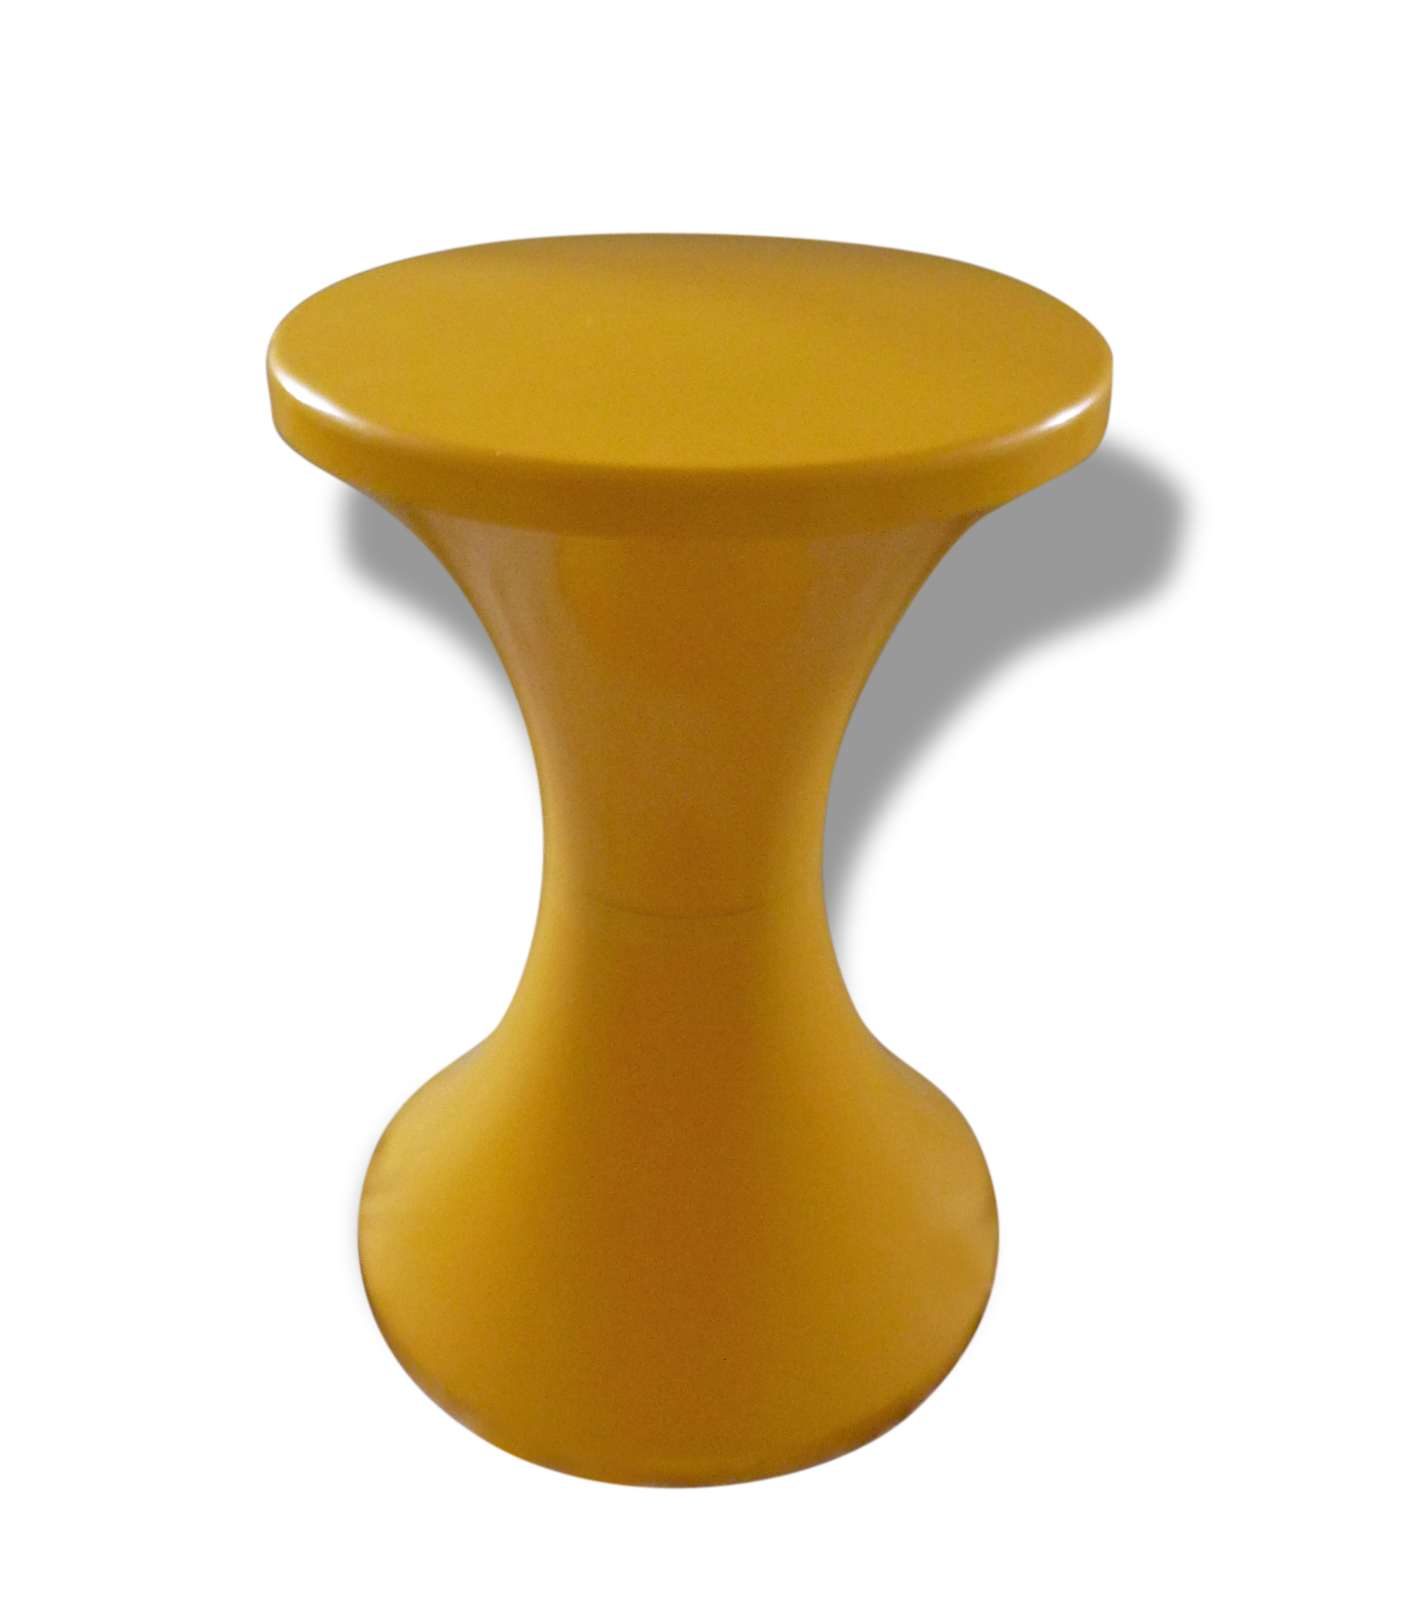 Tabouret Tam Tam Original tabouret tam tam orange vintage meubles, décoration du xxe